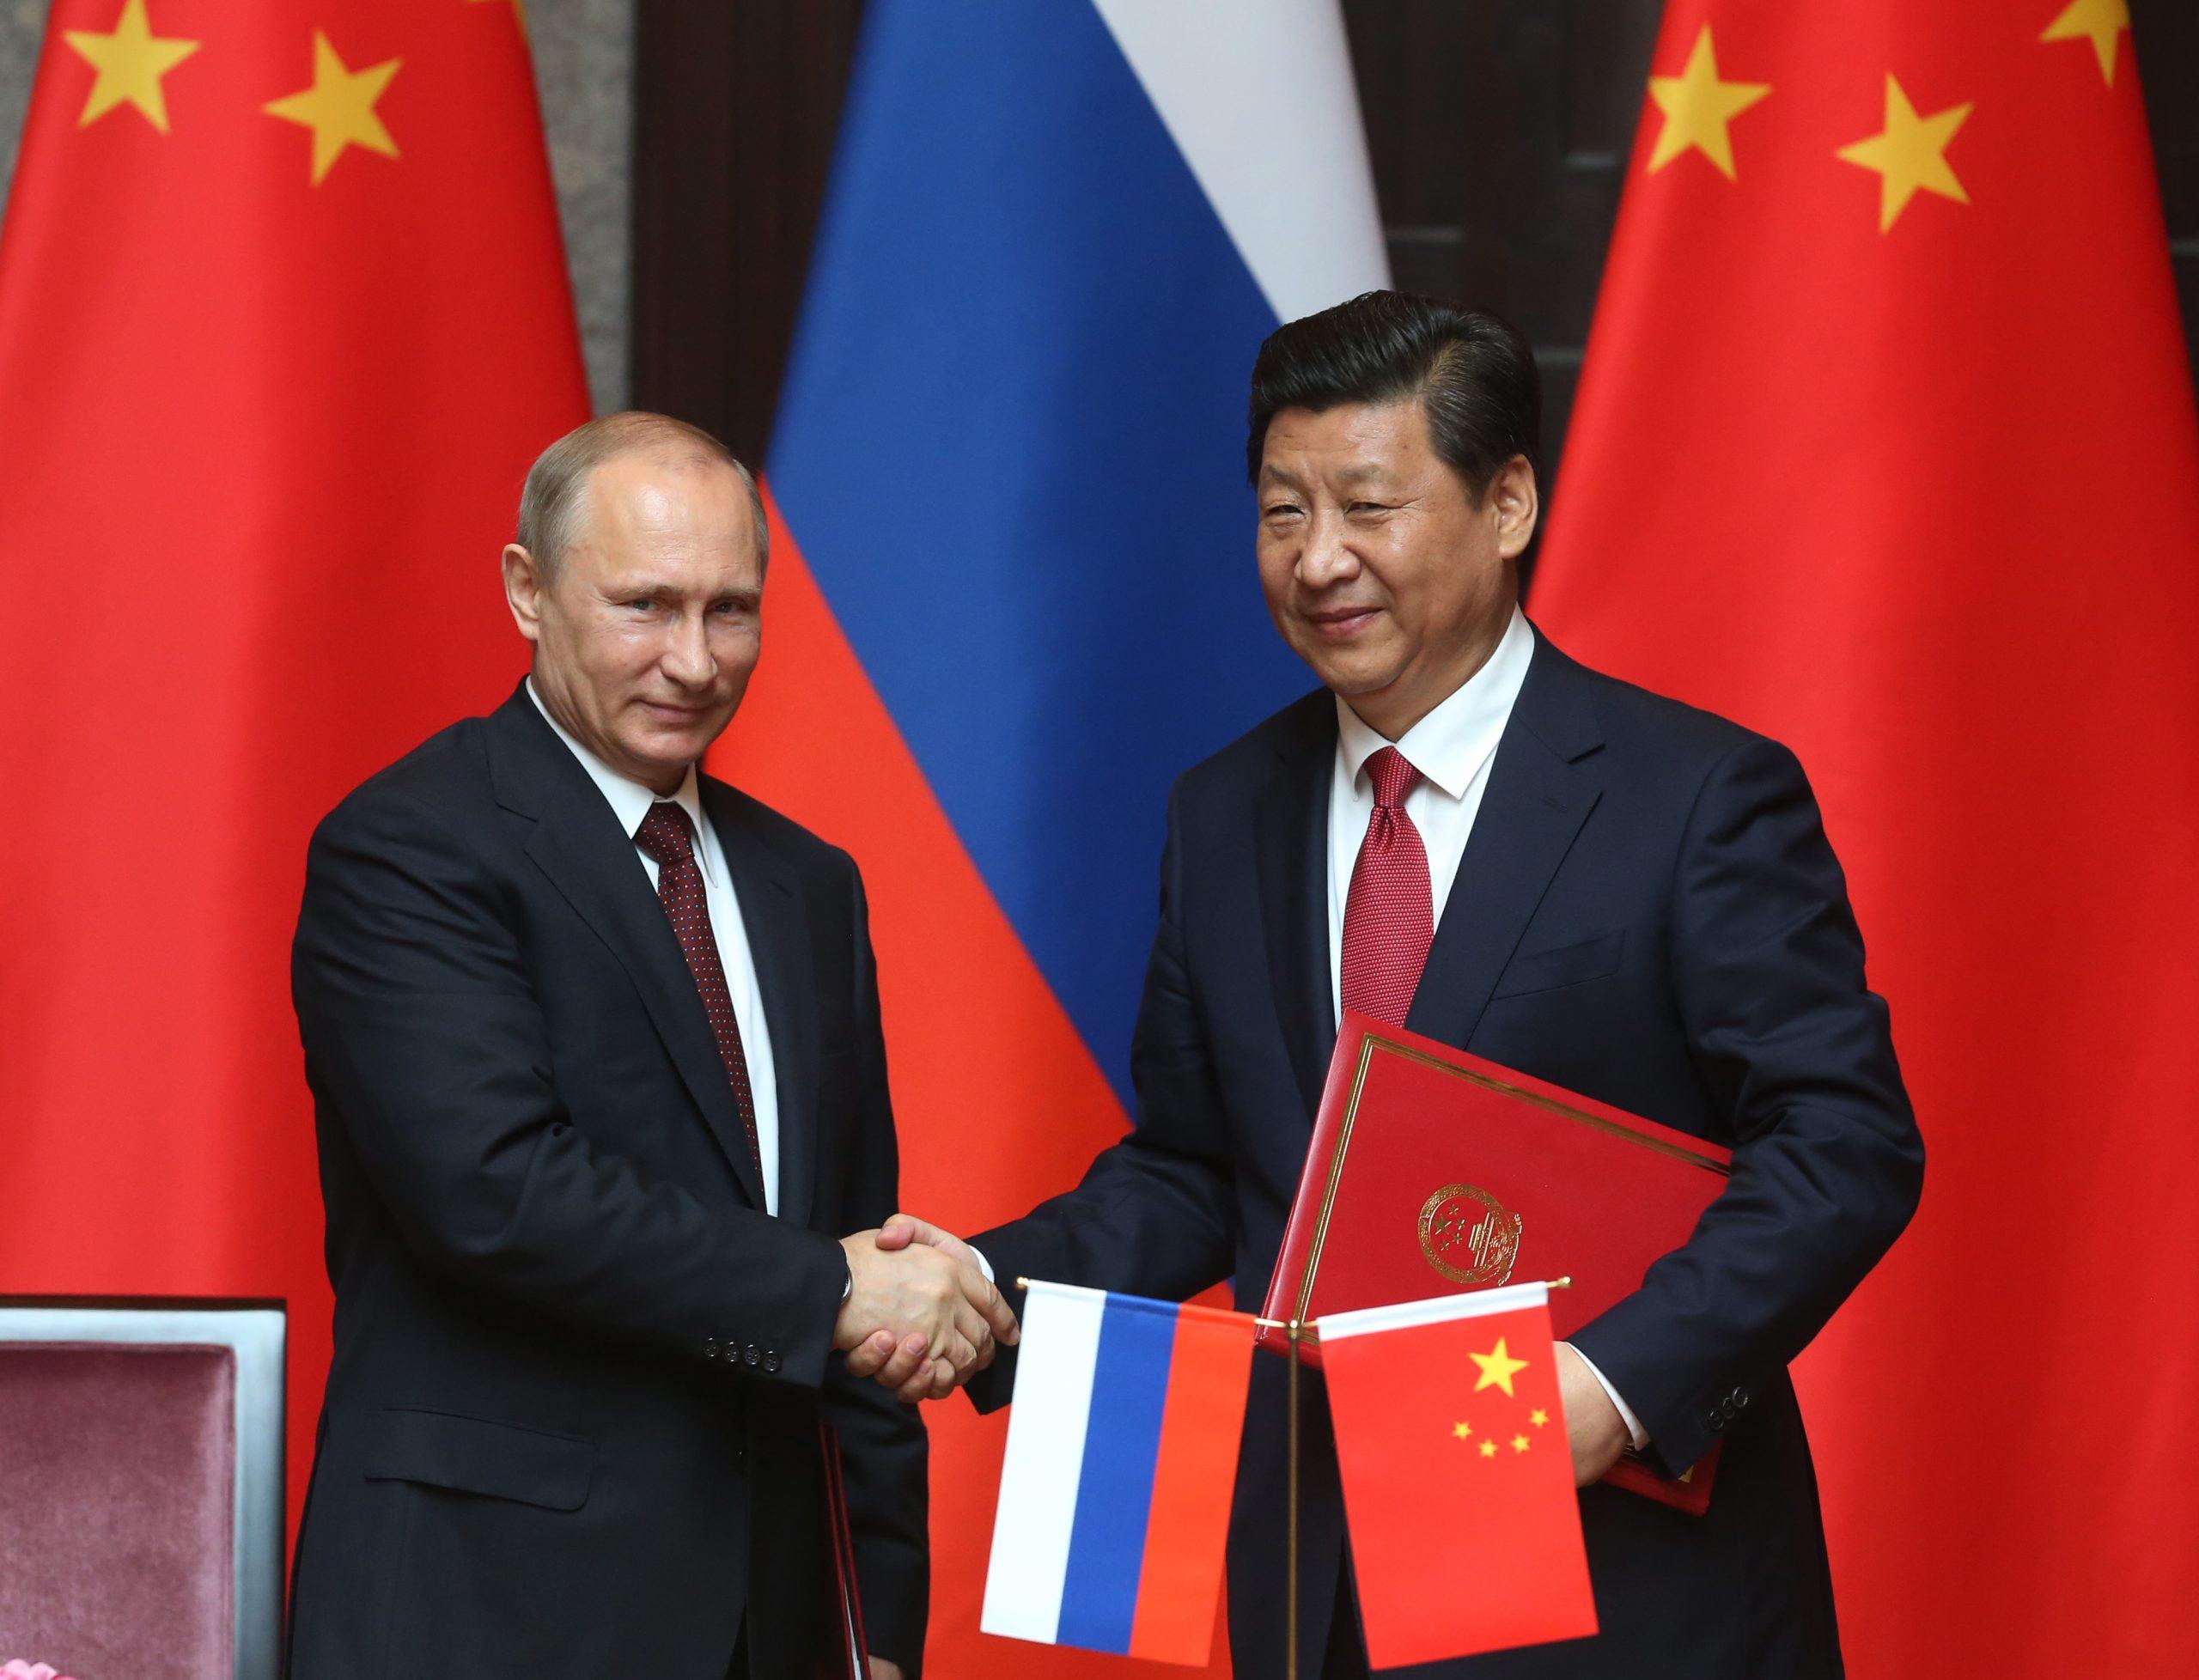 China, Russia, Mexico decline to acknowledge Biden's victory